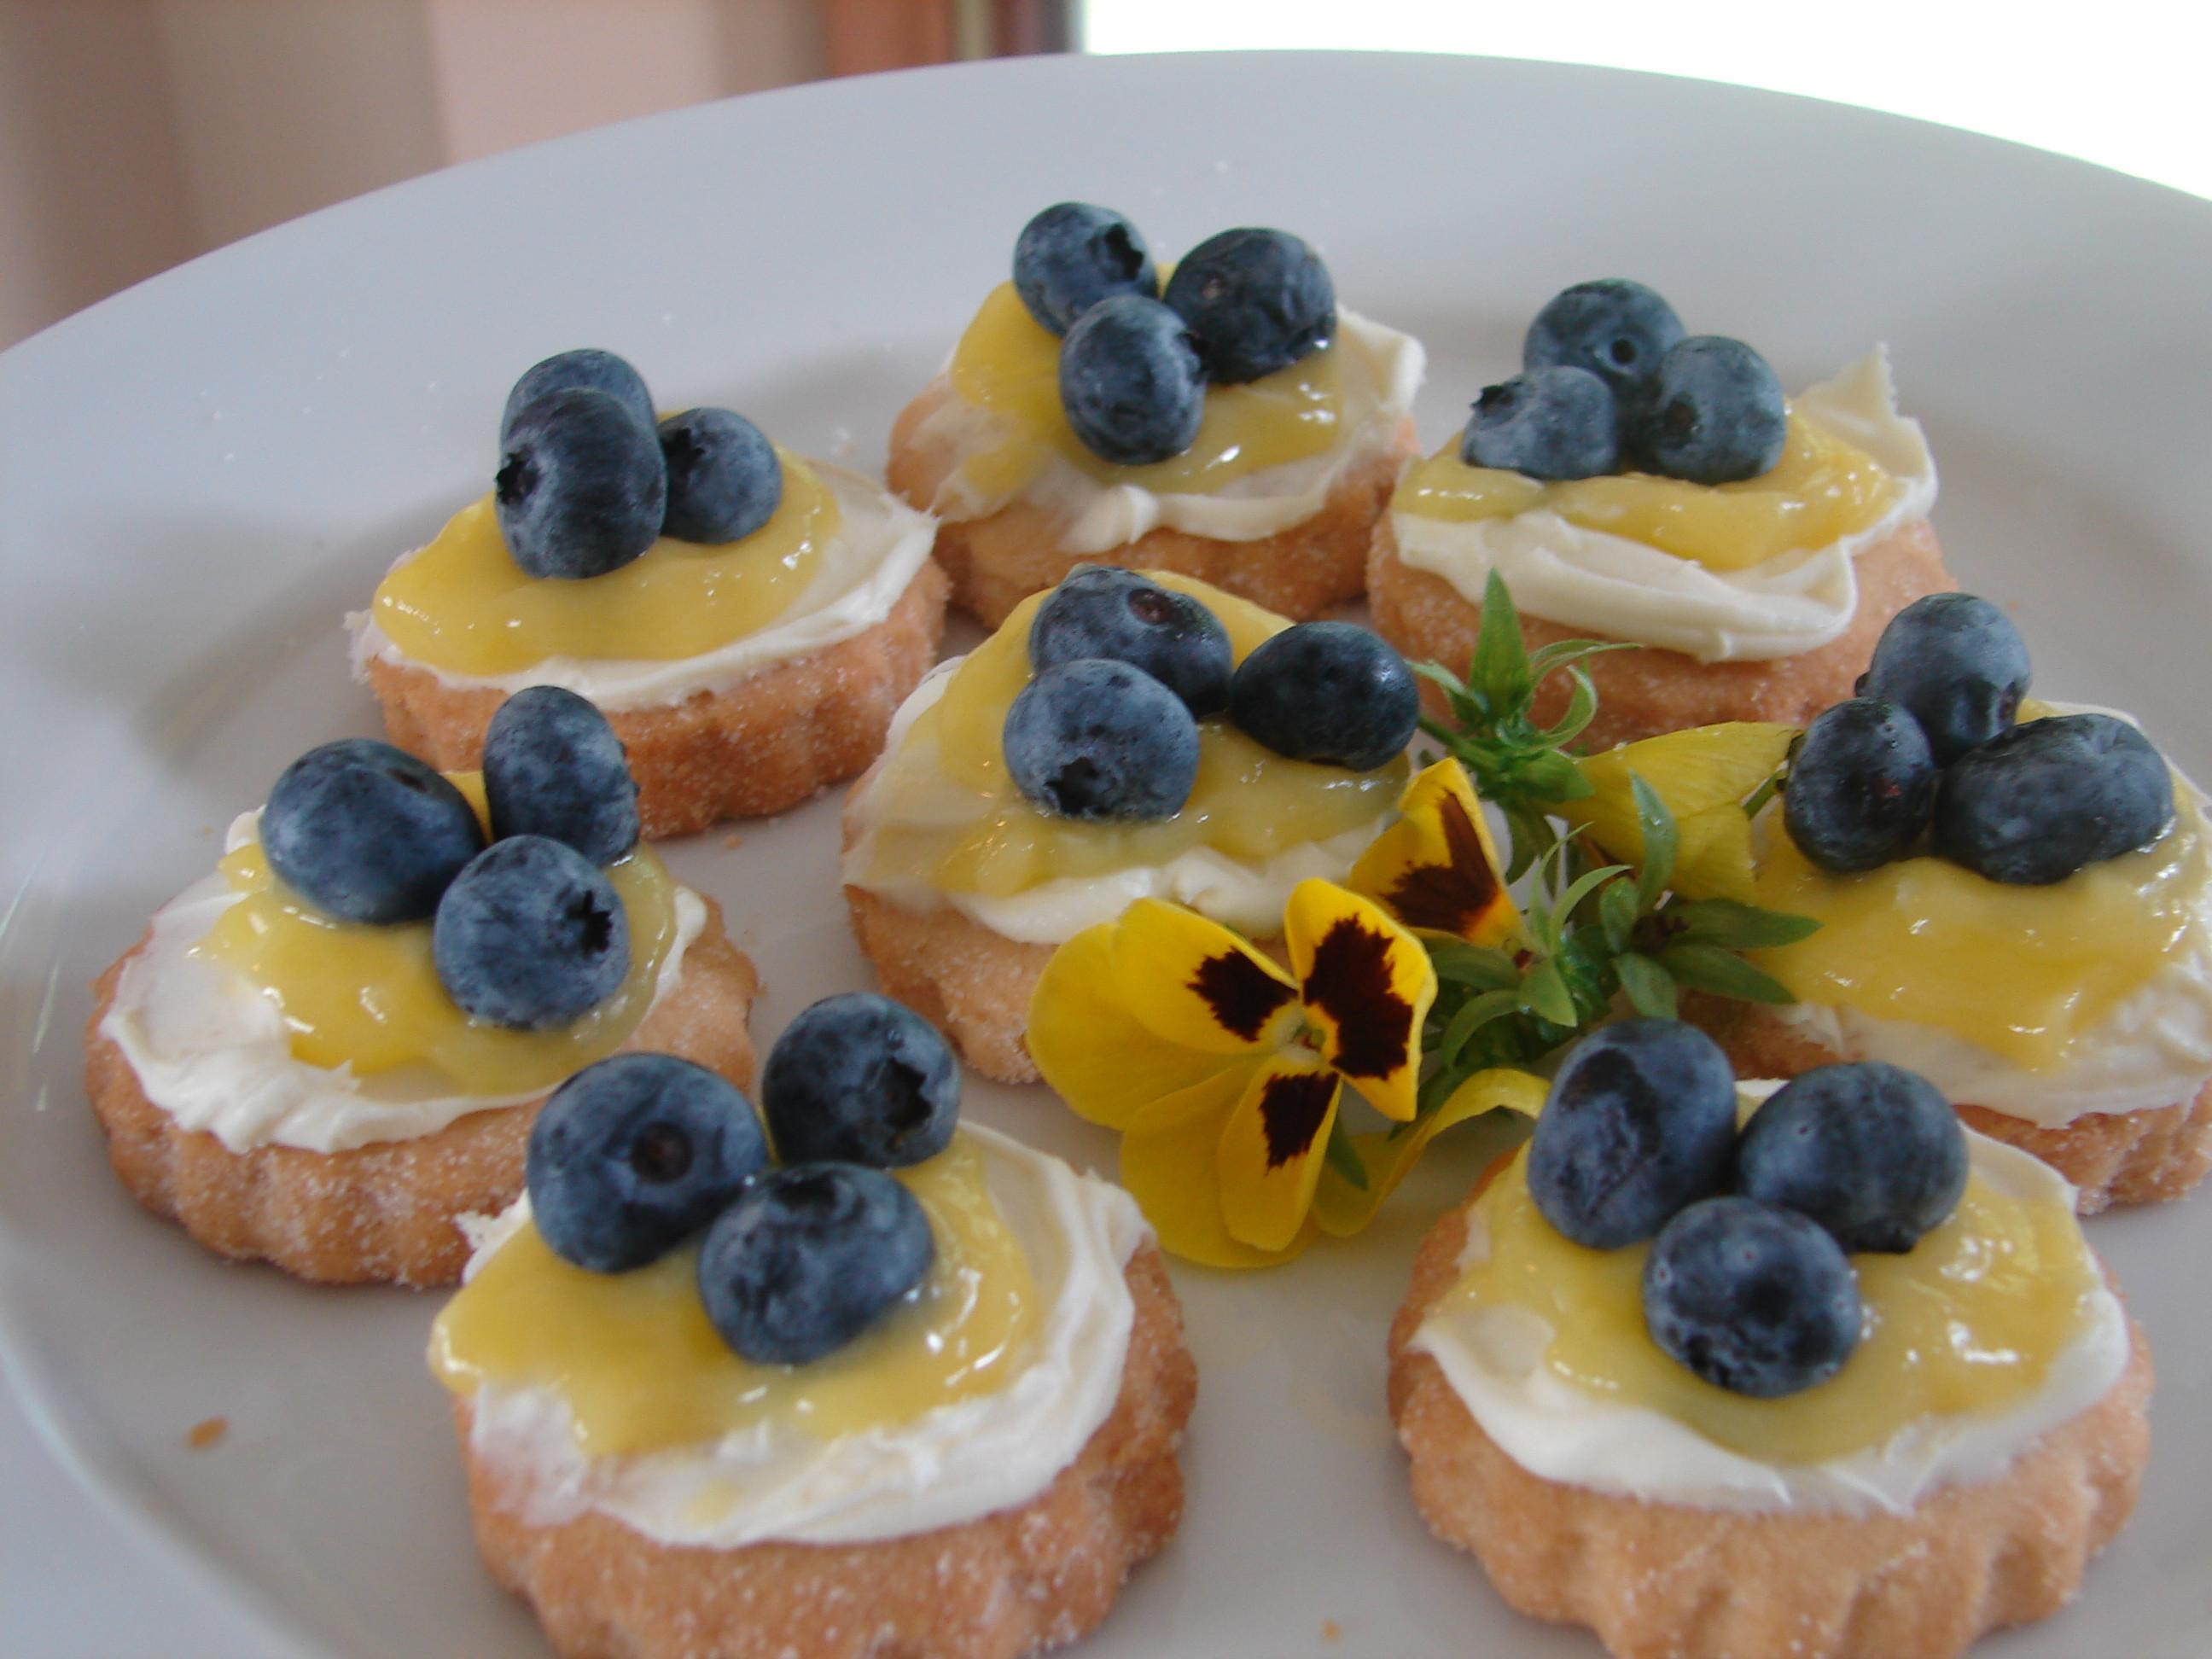 Summer Blueberry Desserts  Summer Entertaining Lemon Shortbread Cookies with